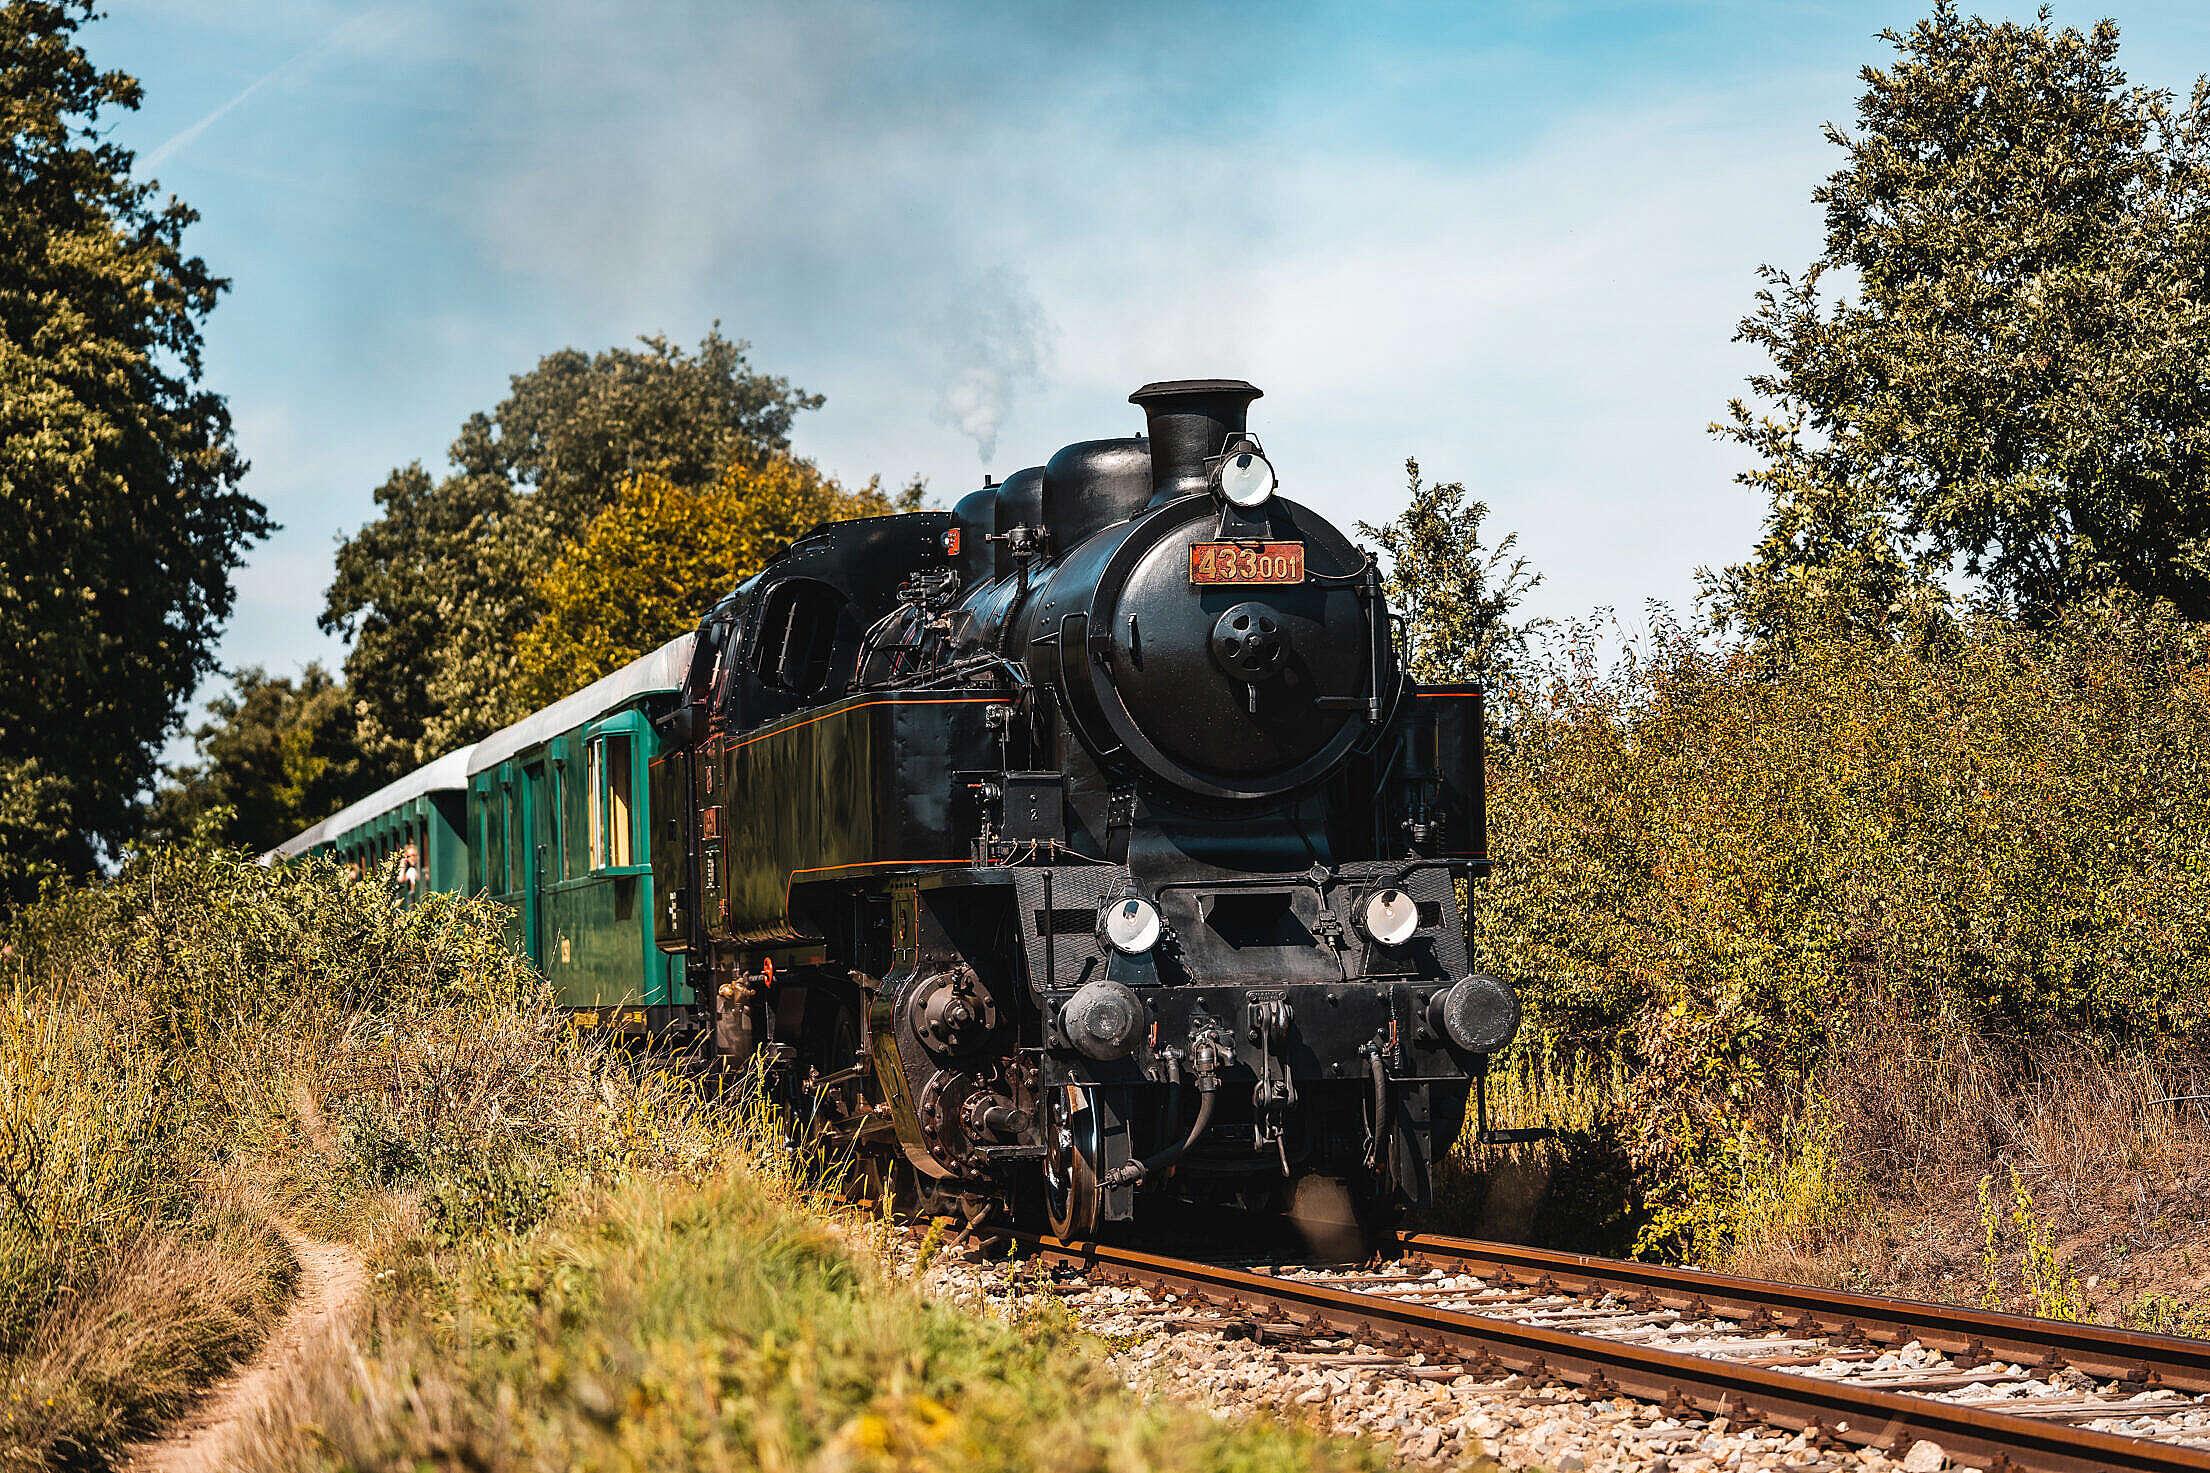 Skaličák 433.001 Old Steam Locomotive Free Stock Photo